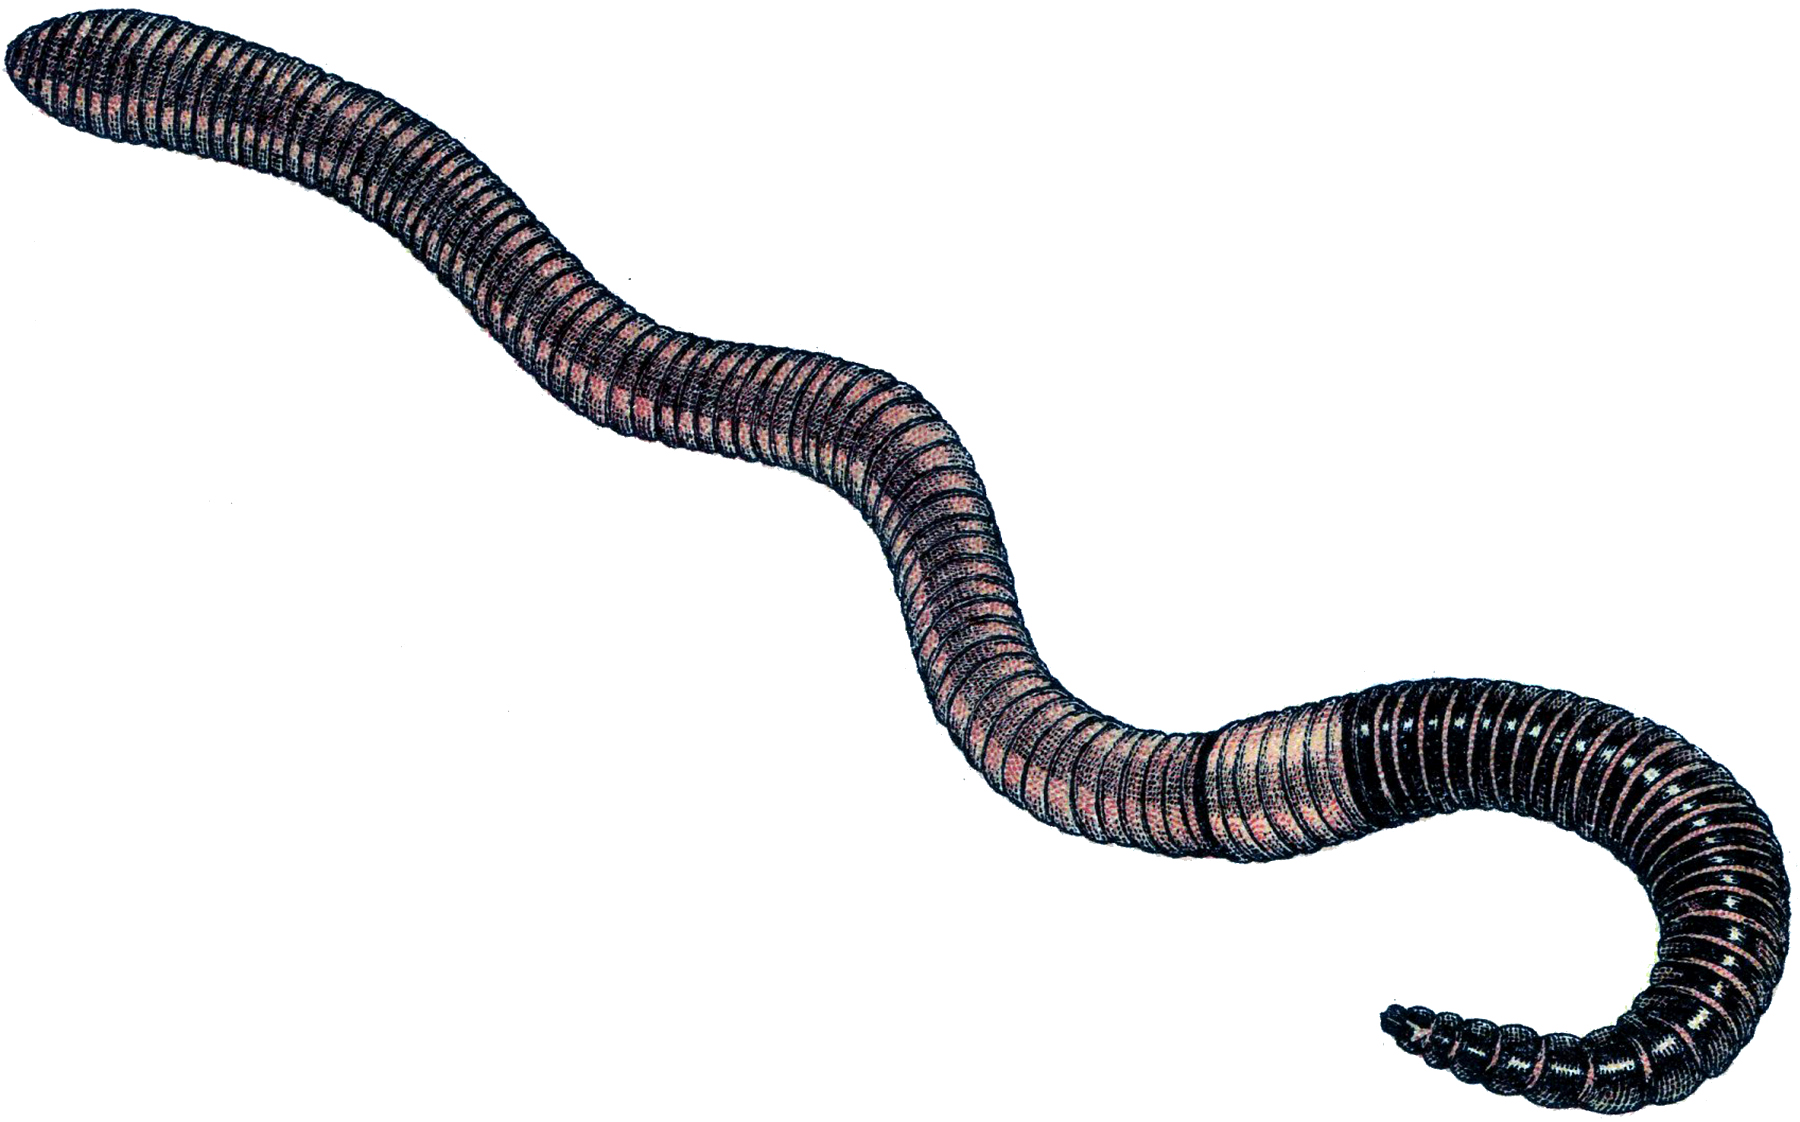 clipart earthworm - photo #4